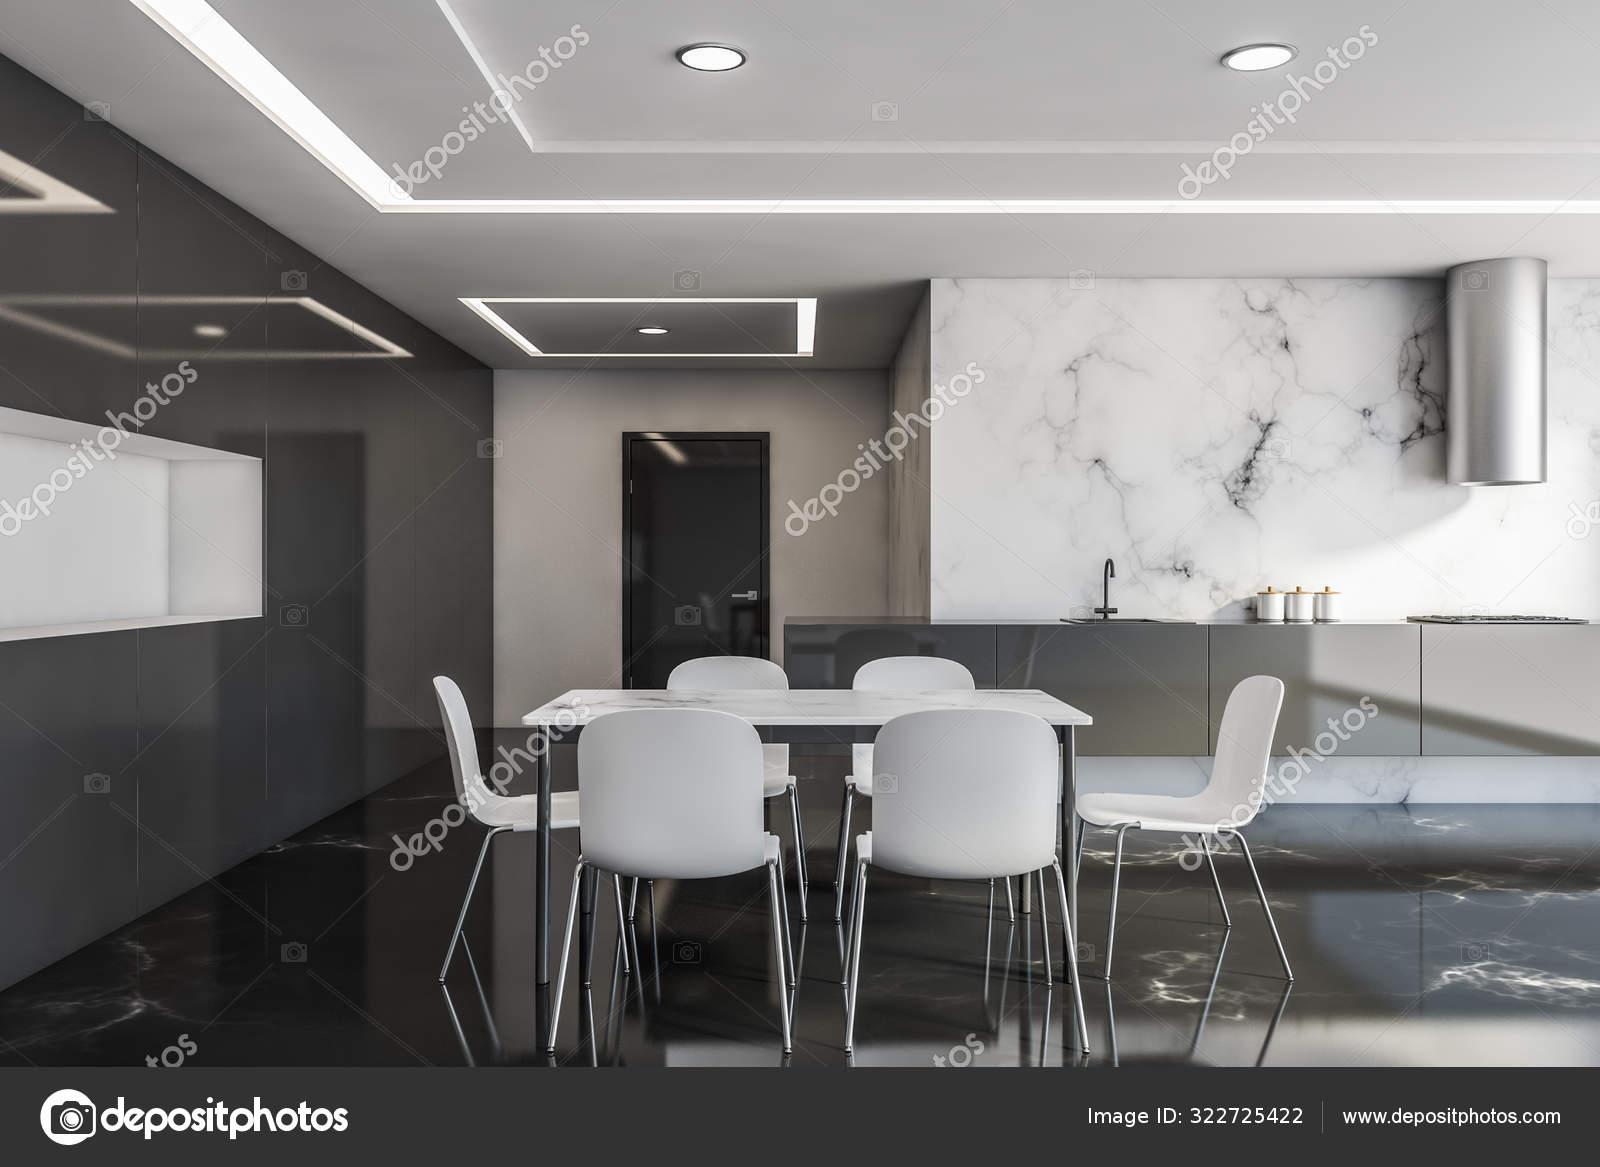 White And Black Marble Kitchen With Table Stock Photo C Denisismagilov 322725422